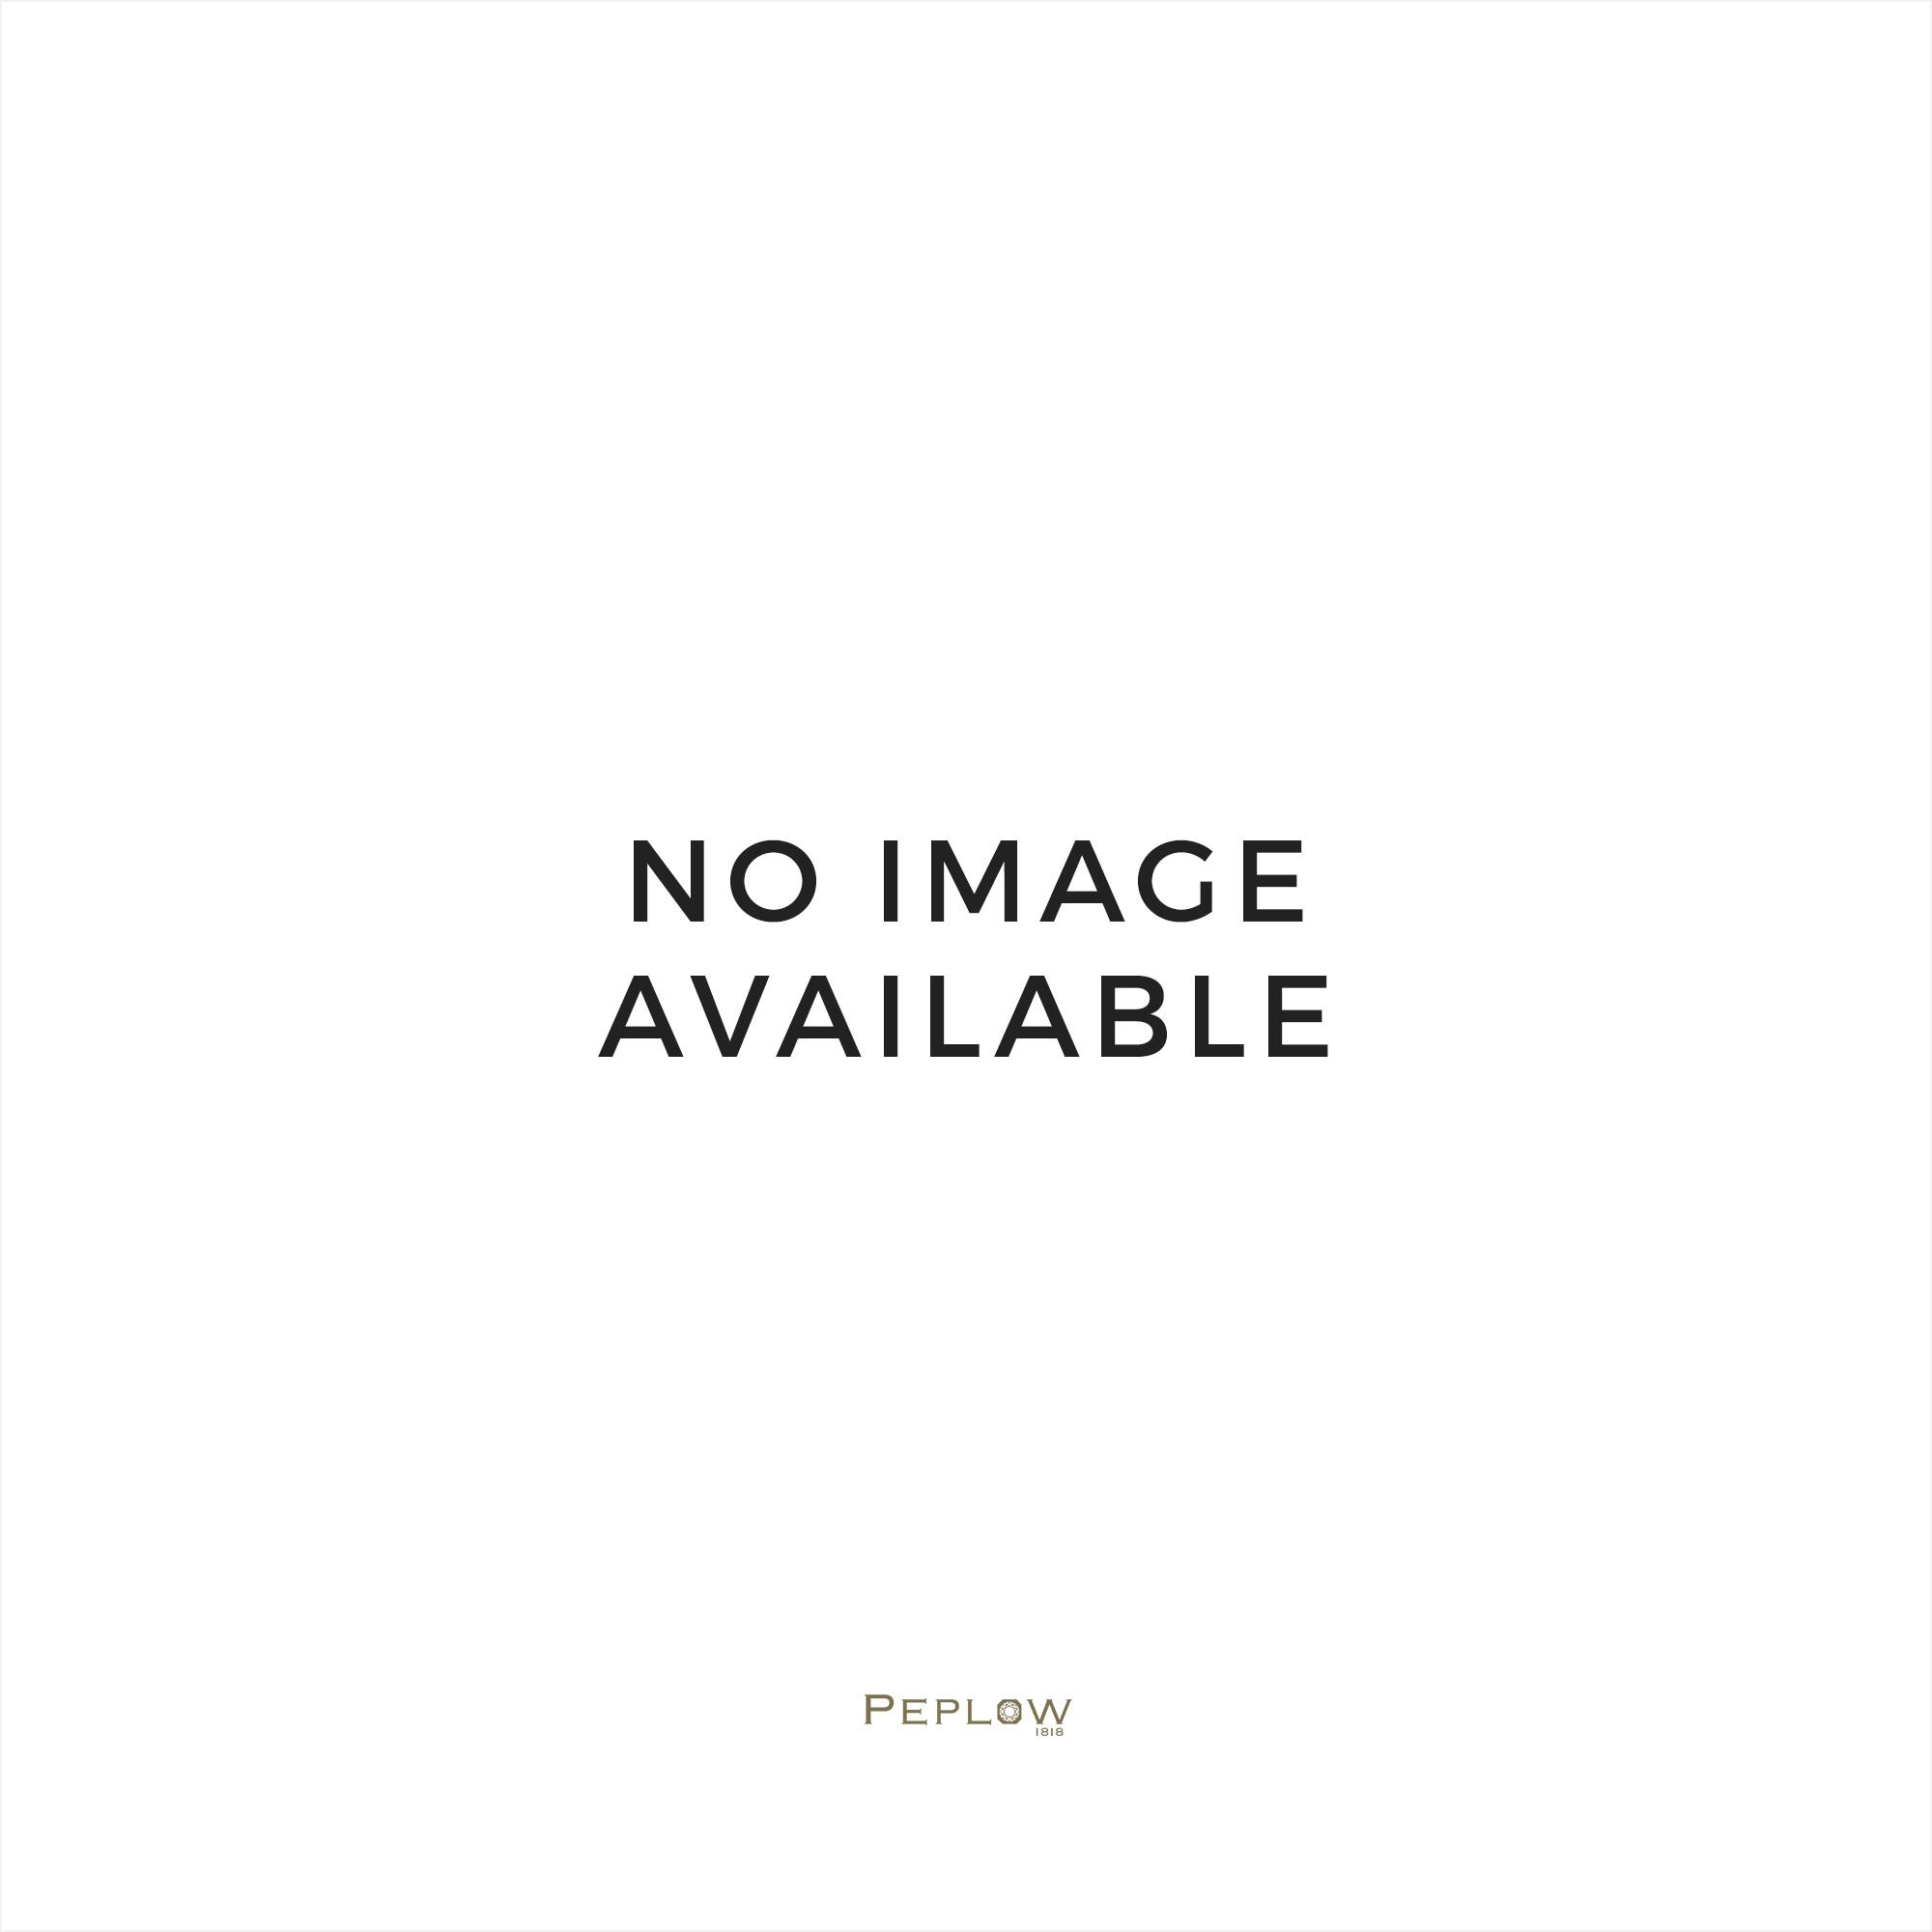 Citizen Watches Citizen Gents Stainless Steel Nighthawk Watch BJ7008-51E